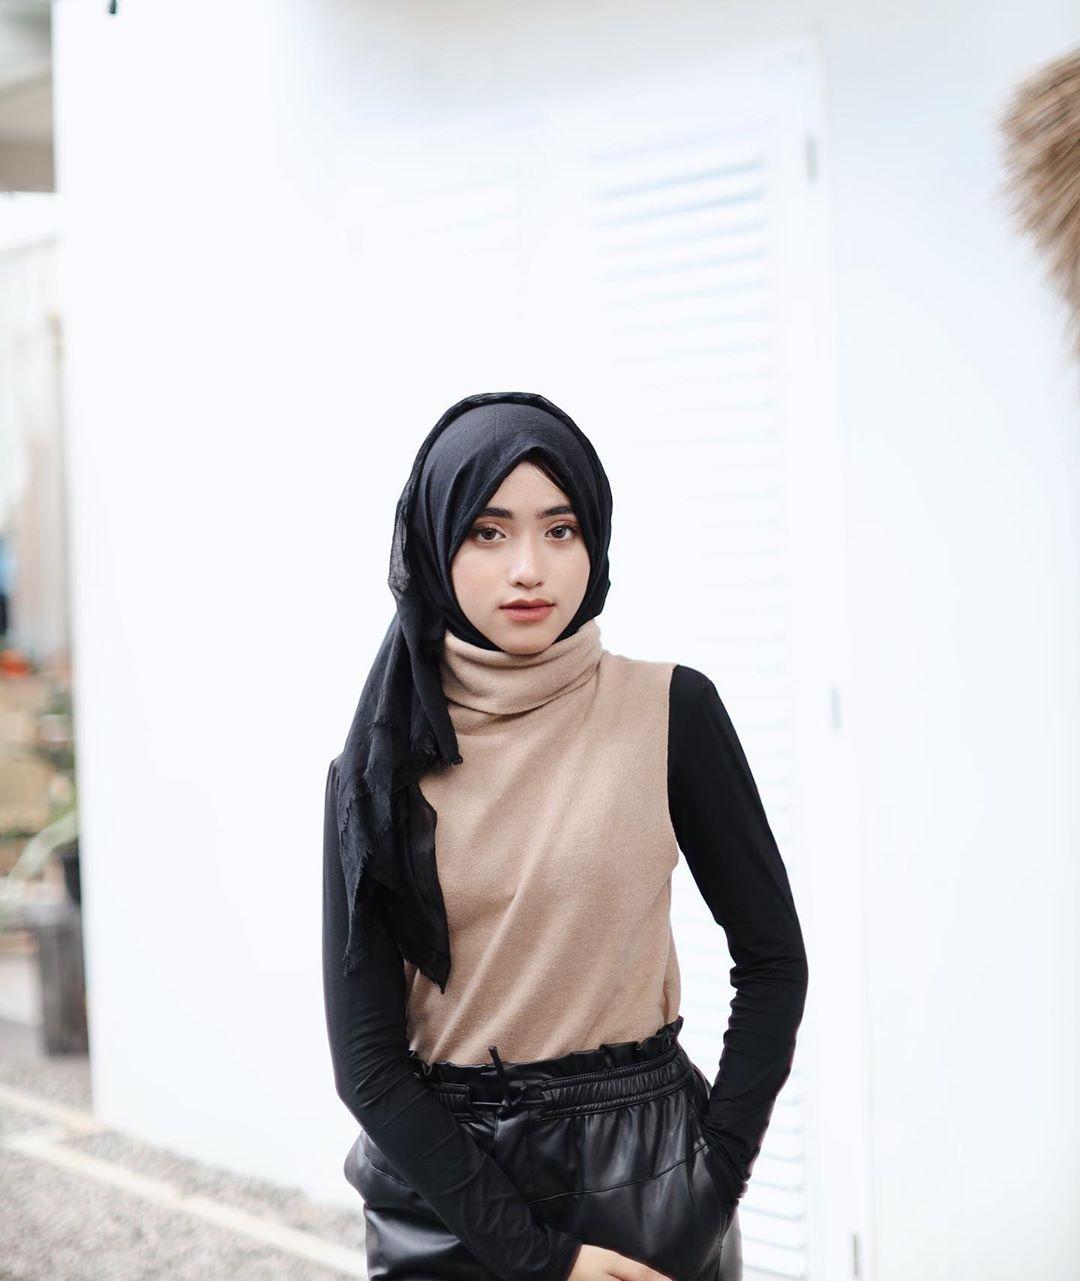 Shirin Al Athrus Shireeenz Instagram Photos And Videos Artofit